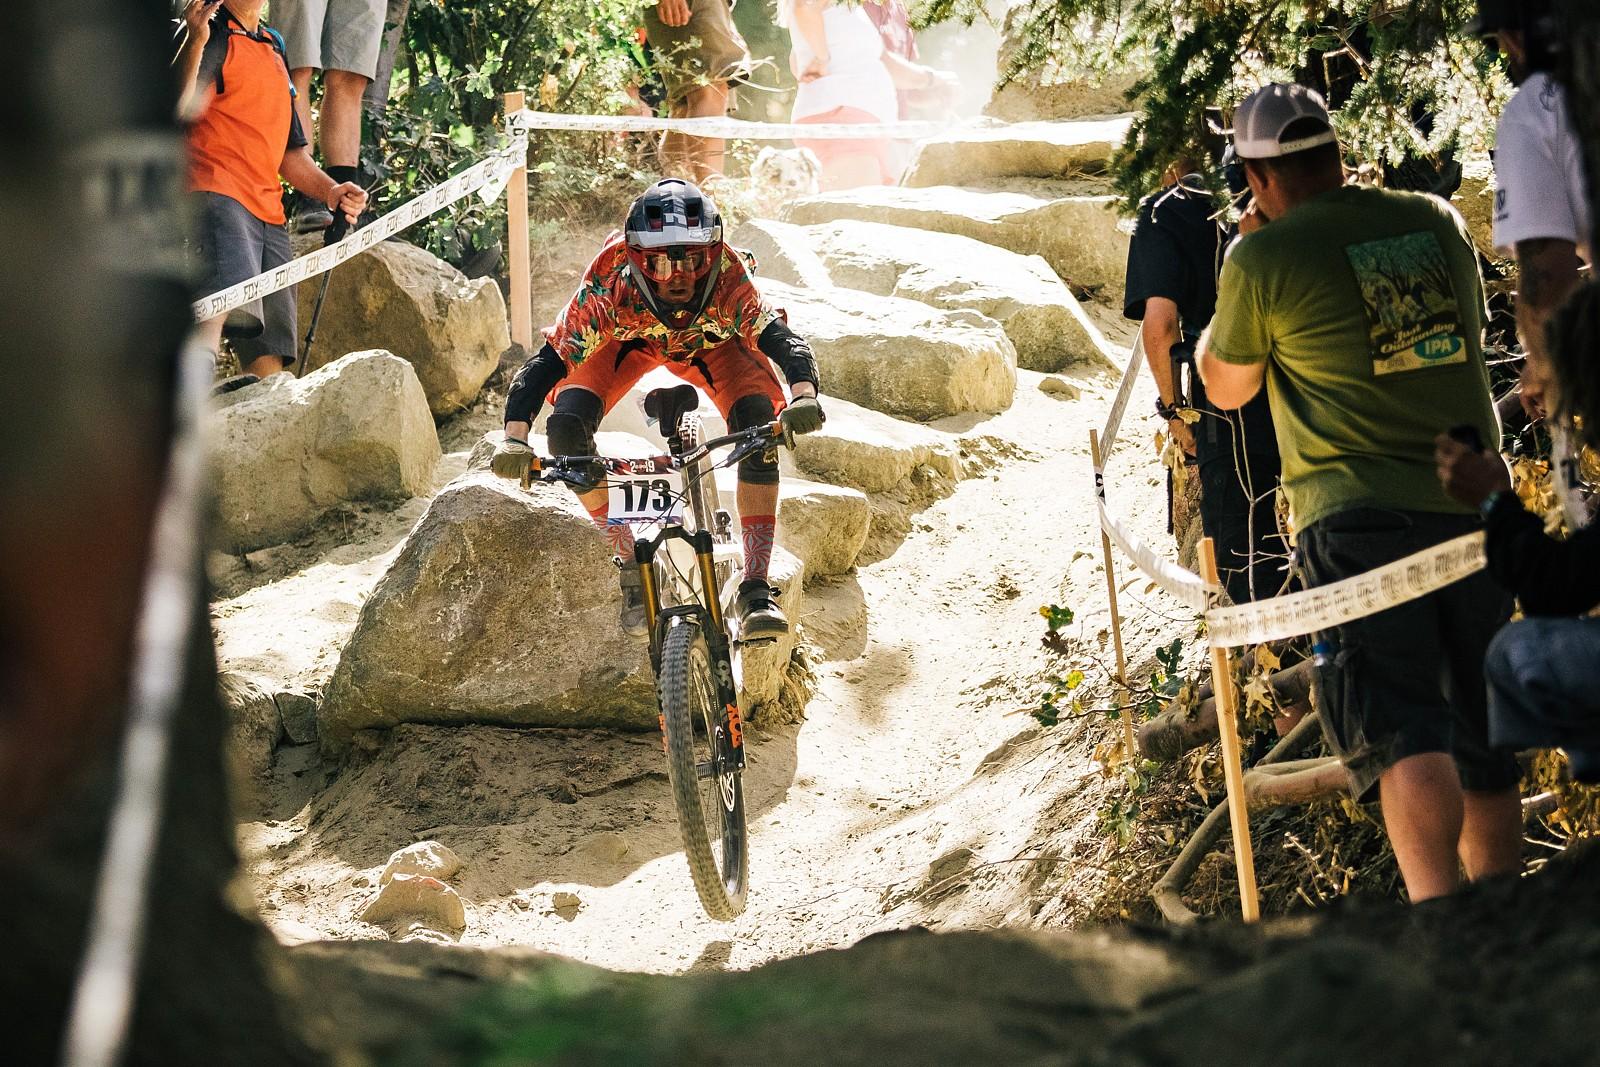 2019USOpenMTB DH yellow-13 - ALeedomPhotography - Mountain Biking Pictures - Vital MTB